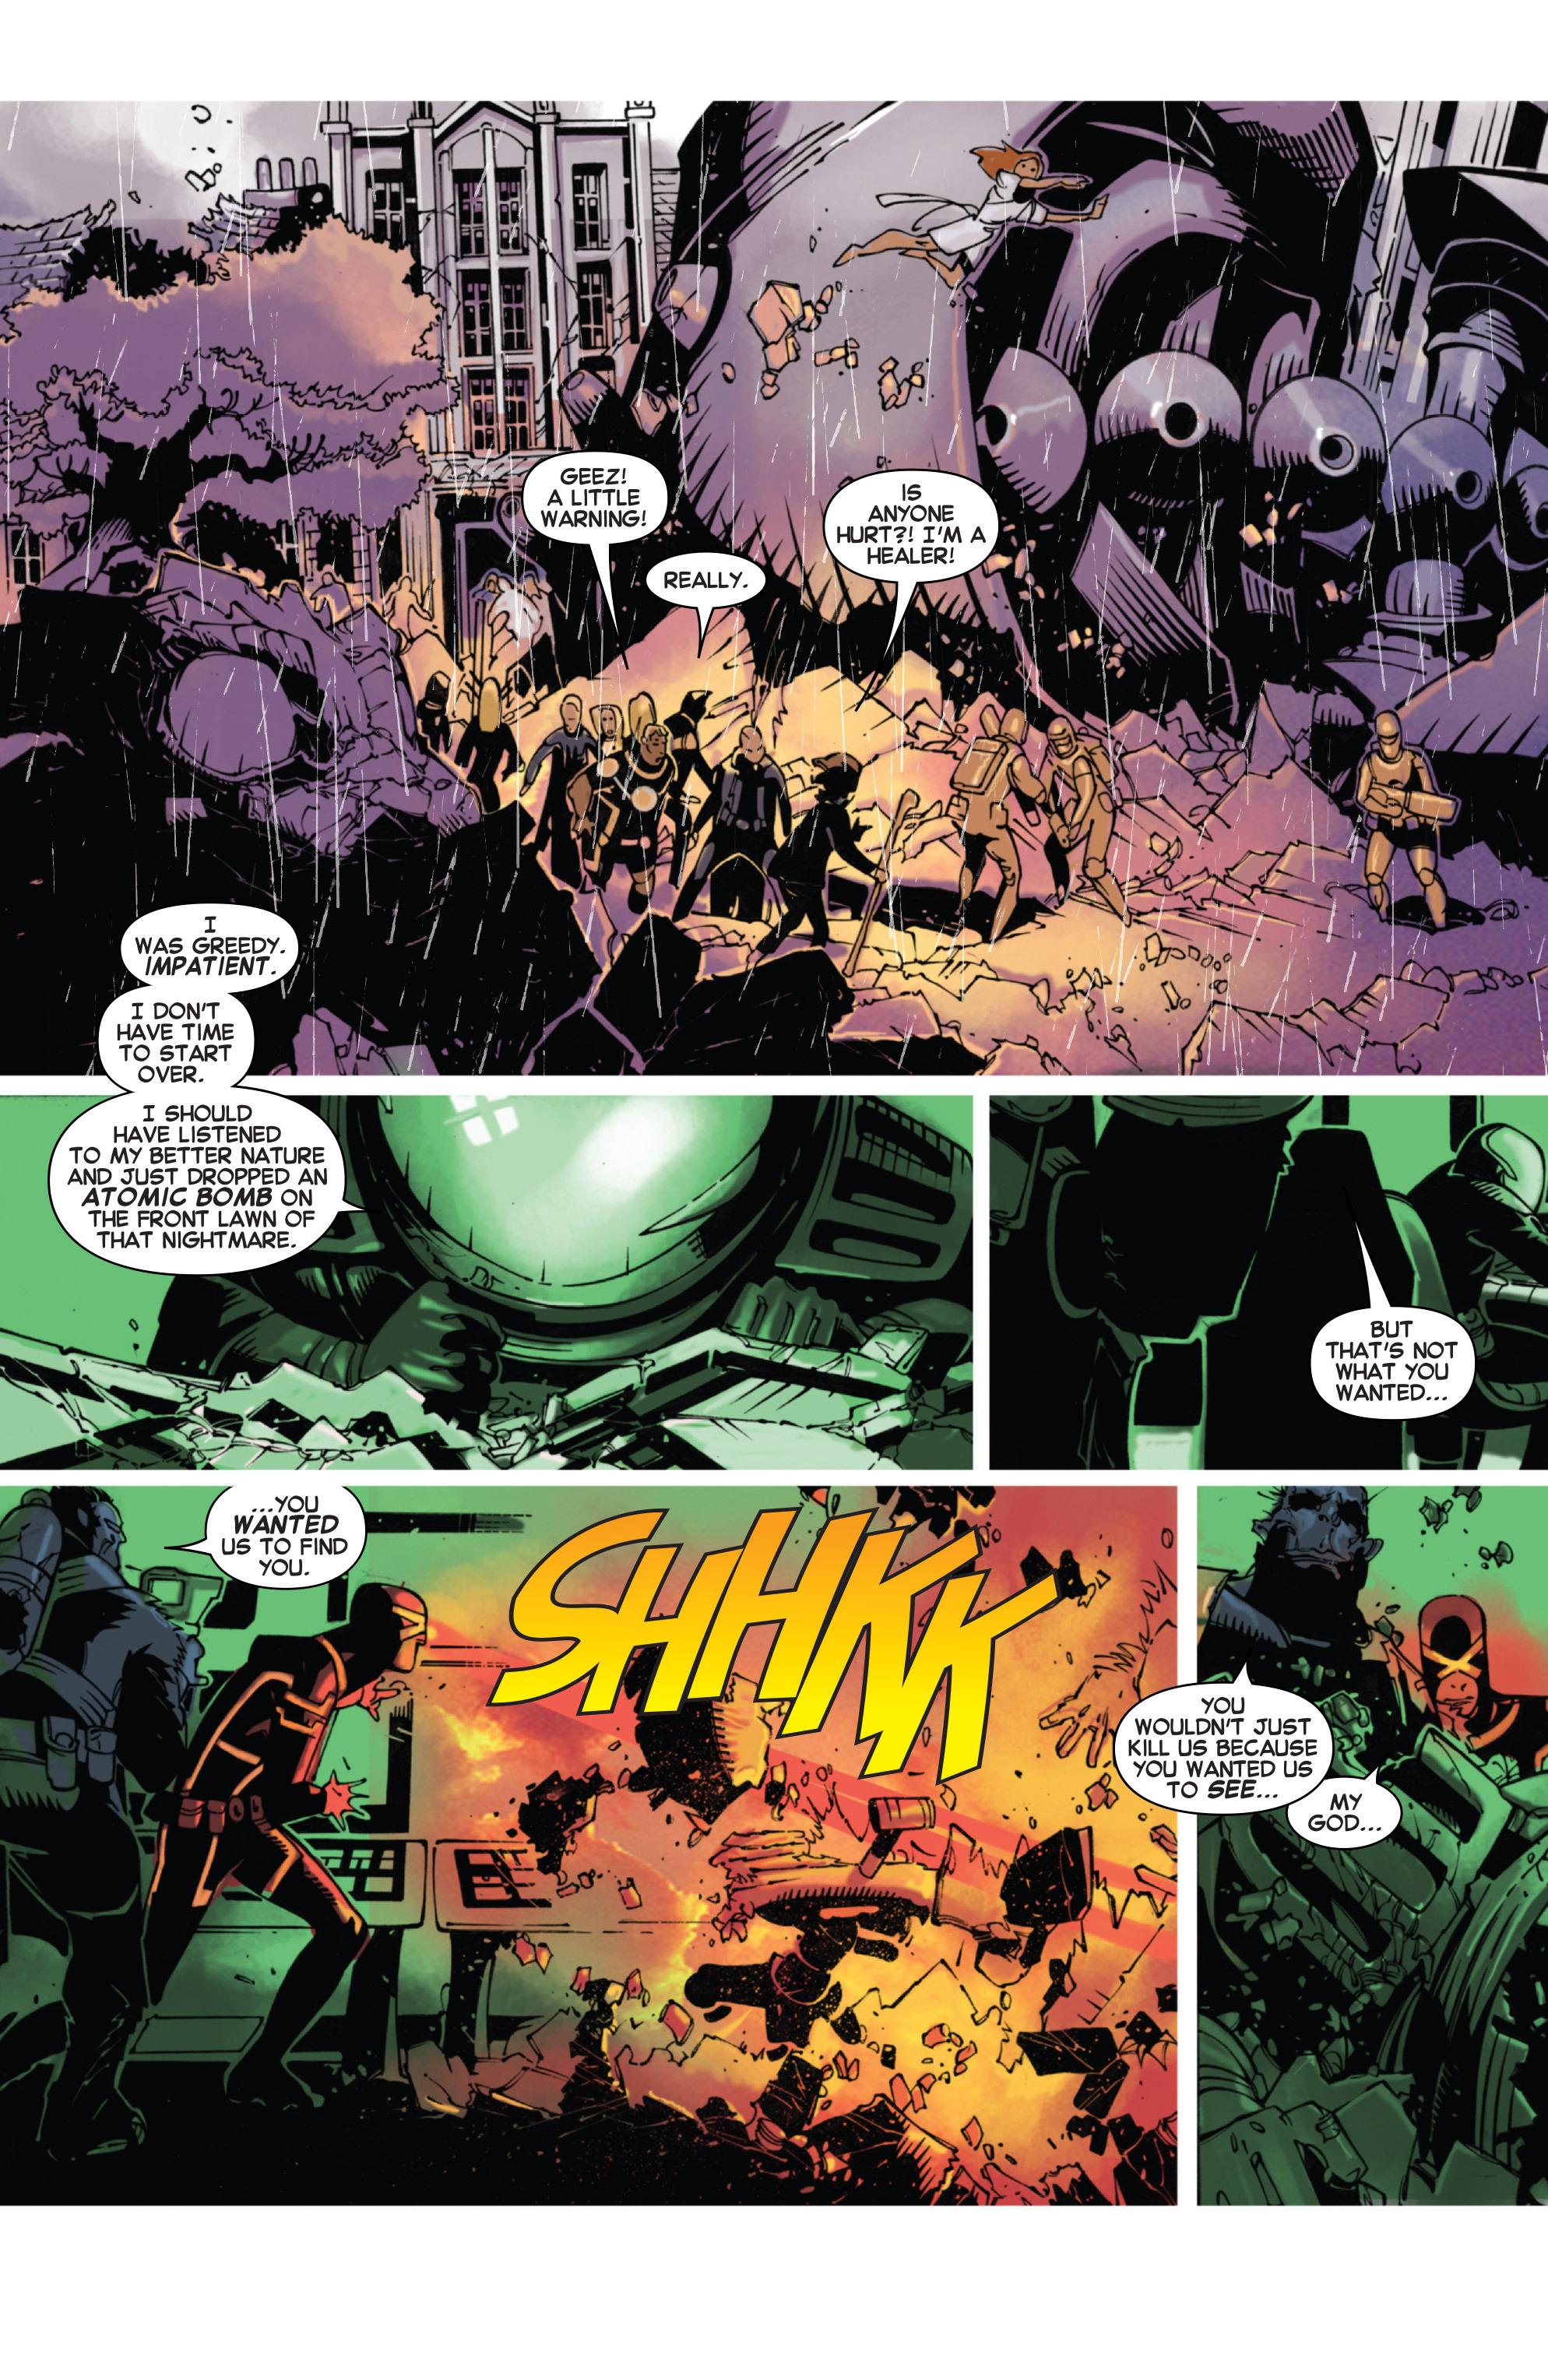 Read online Uncanny X-Men (2013) comic -  Issue # _TPB 4 - vs. S.H.I.E.L.D - 74